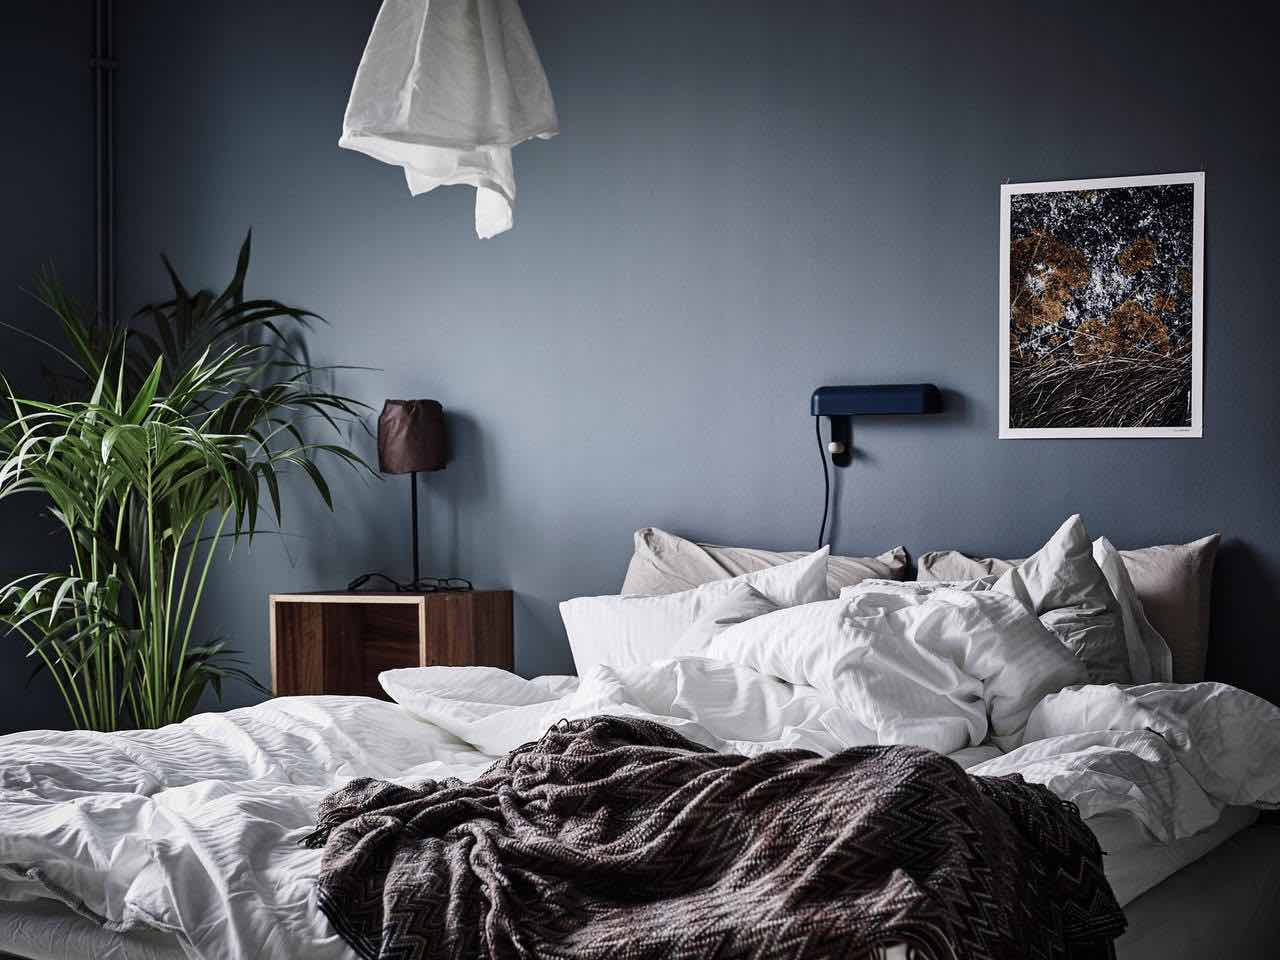 Wandfarbe Schlafzimmer Grau: Wandfarbe grau Ideen (. Bilder ...